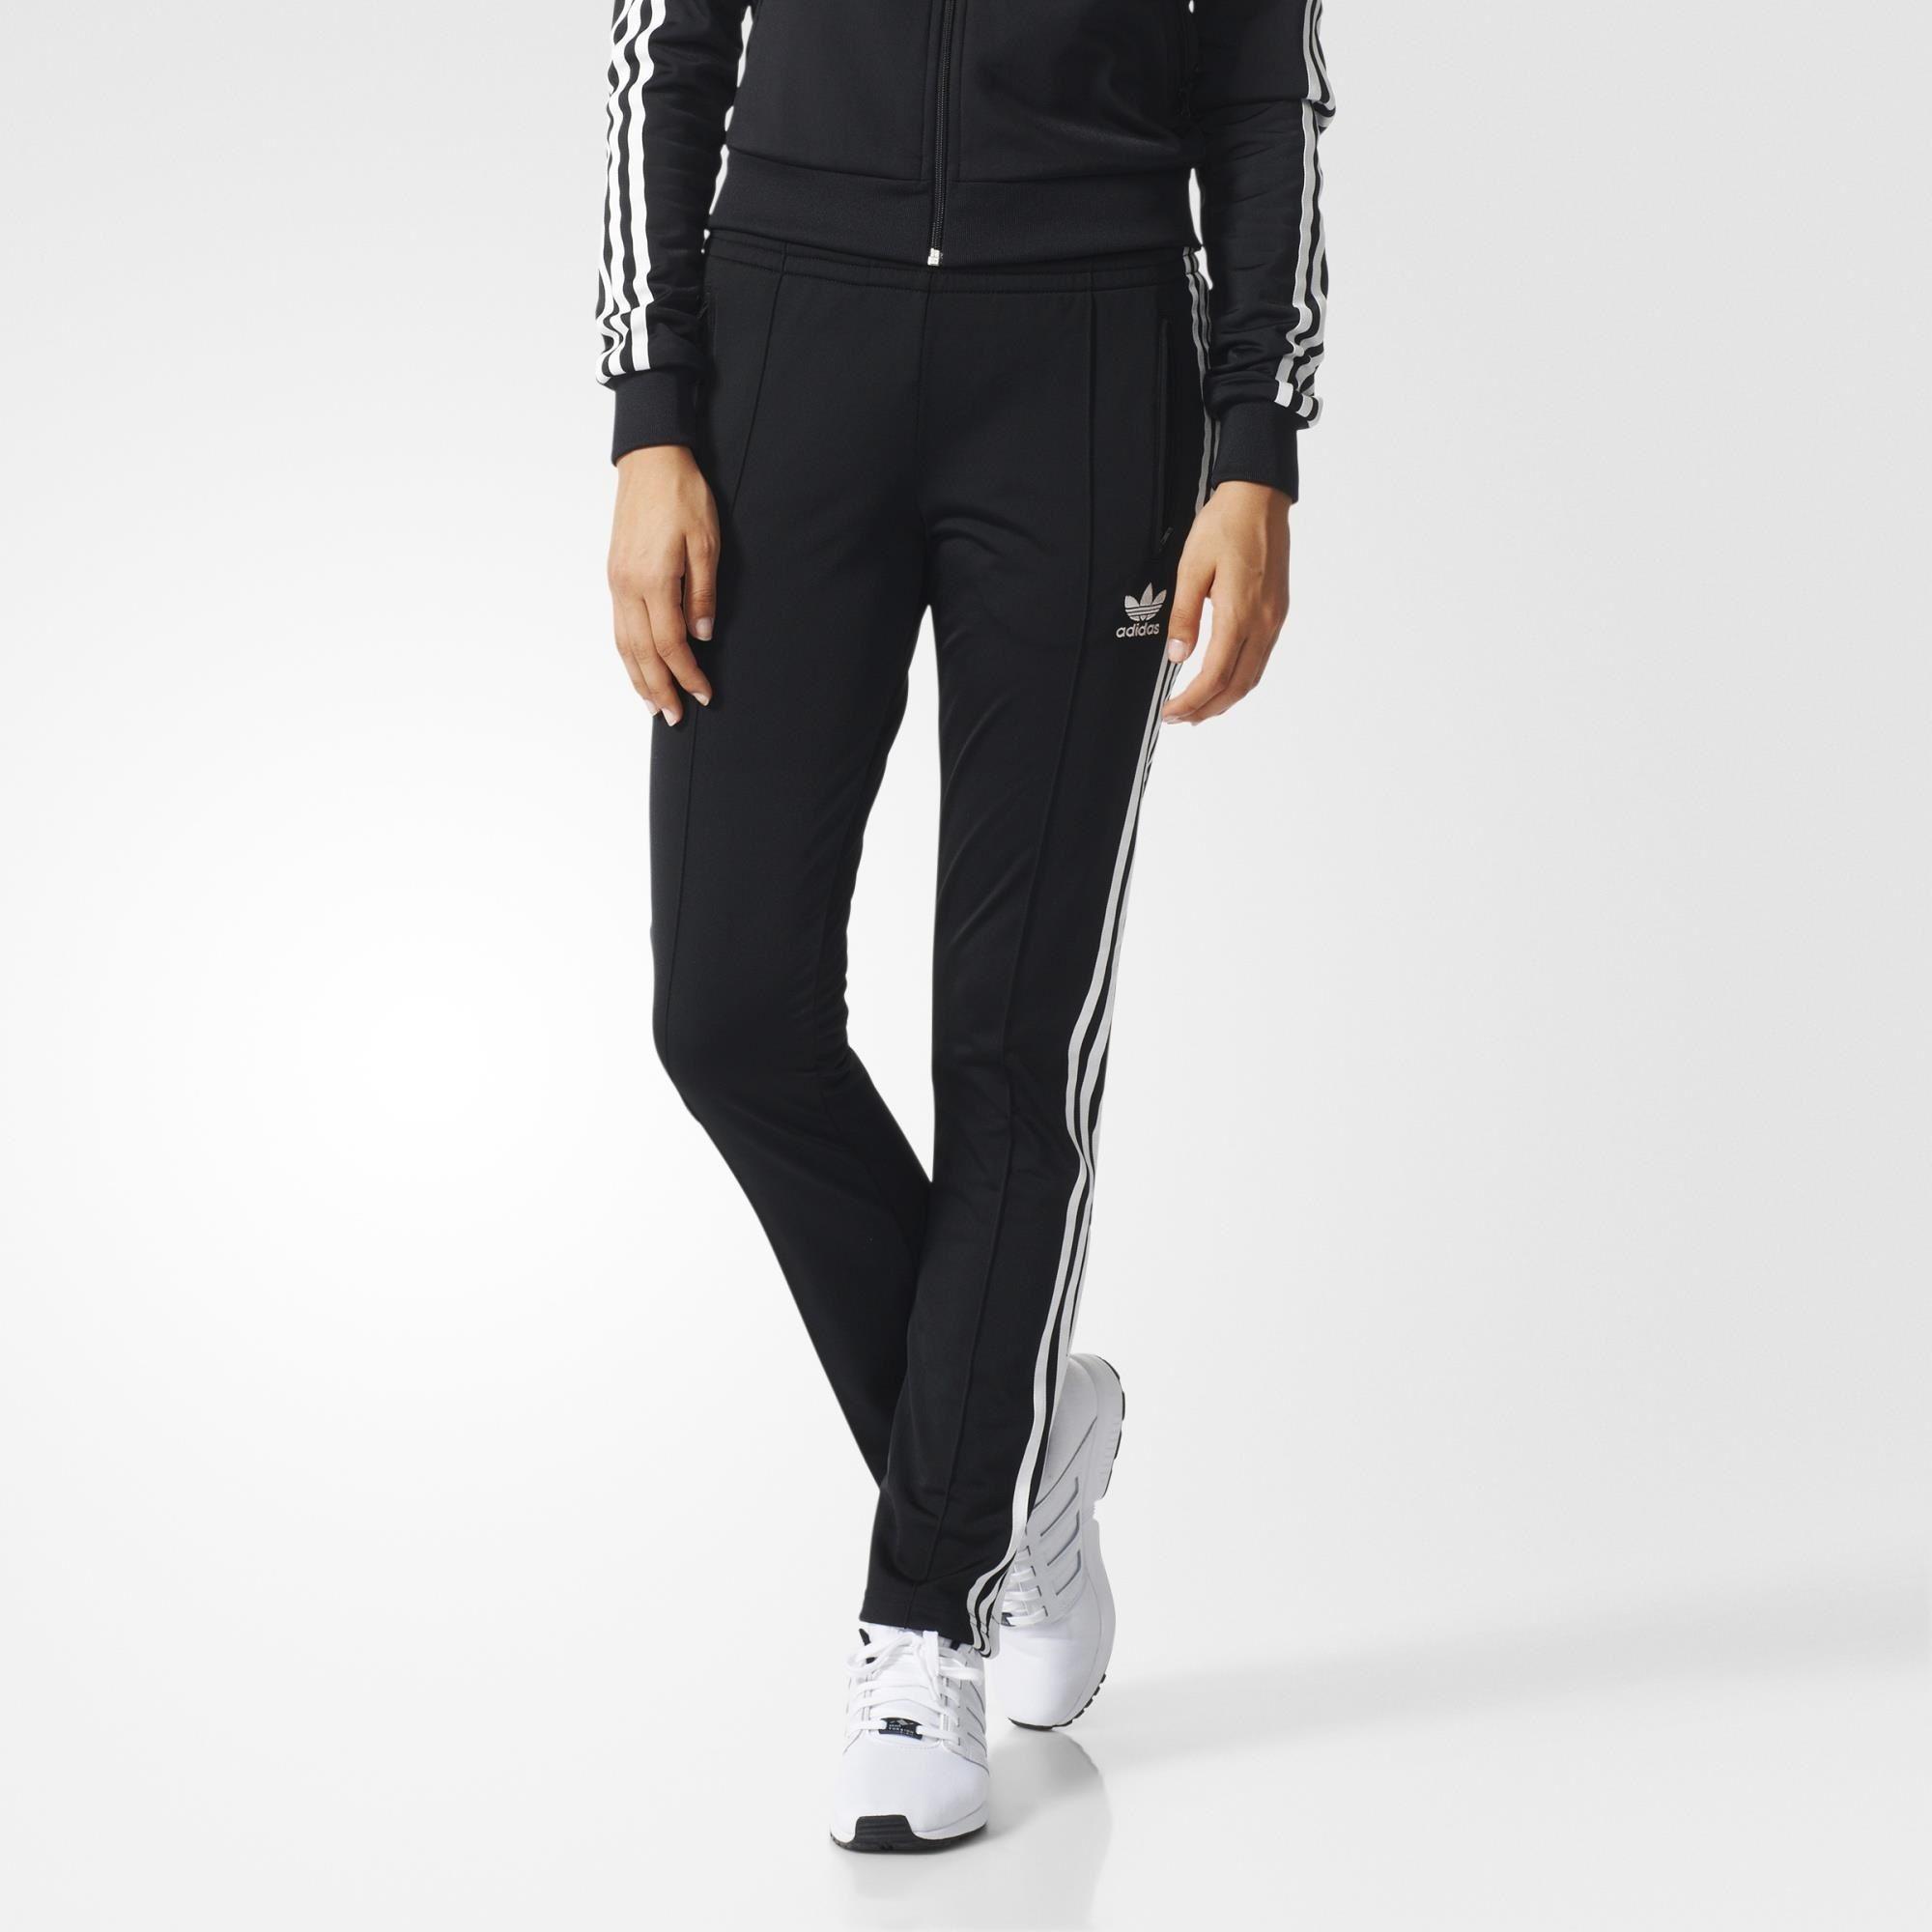 d61b3bd34194 adidas Firebird Track Pants - Black